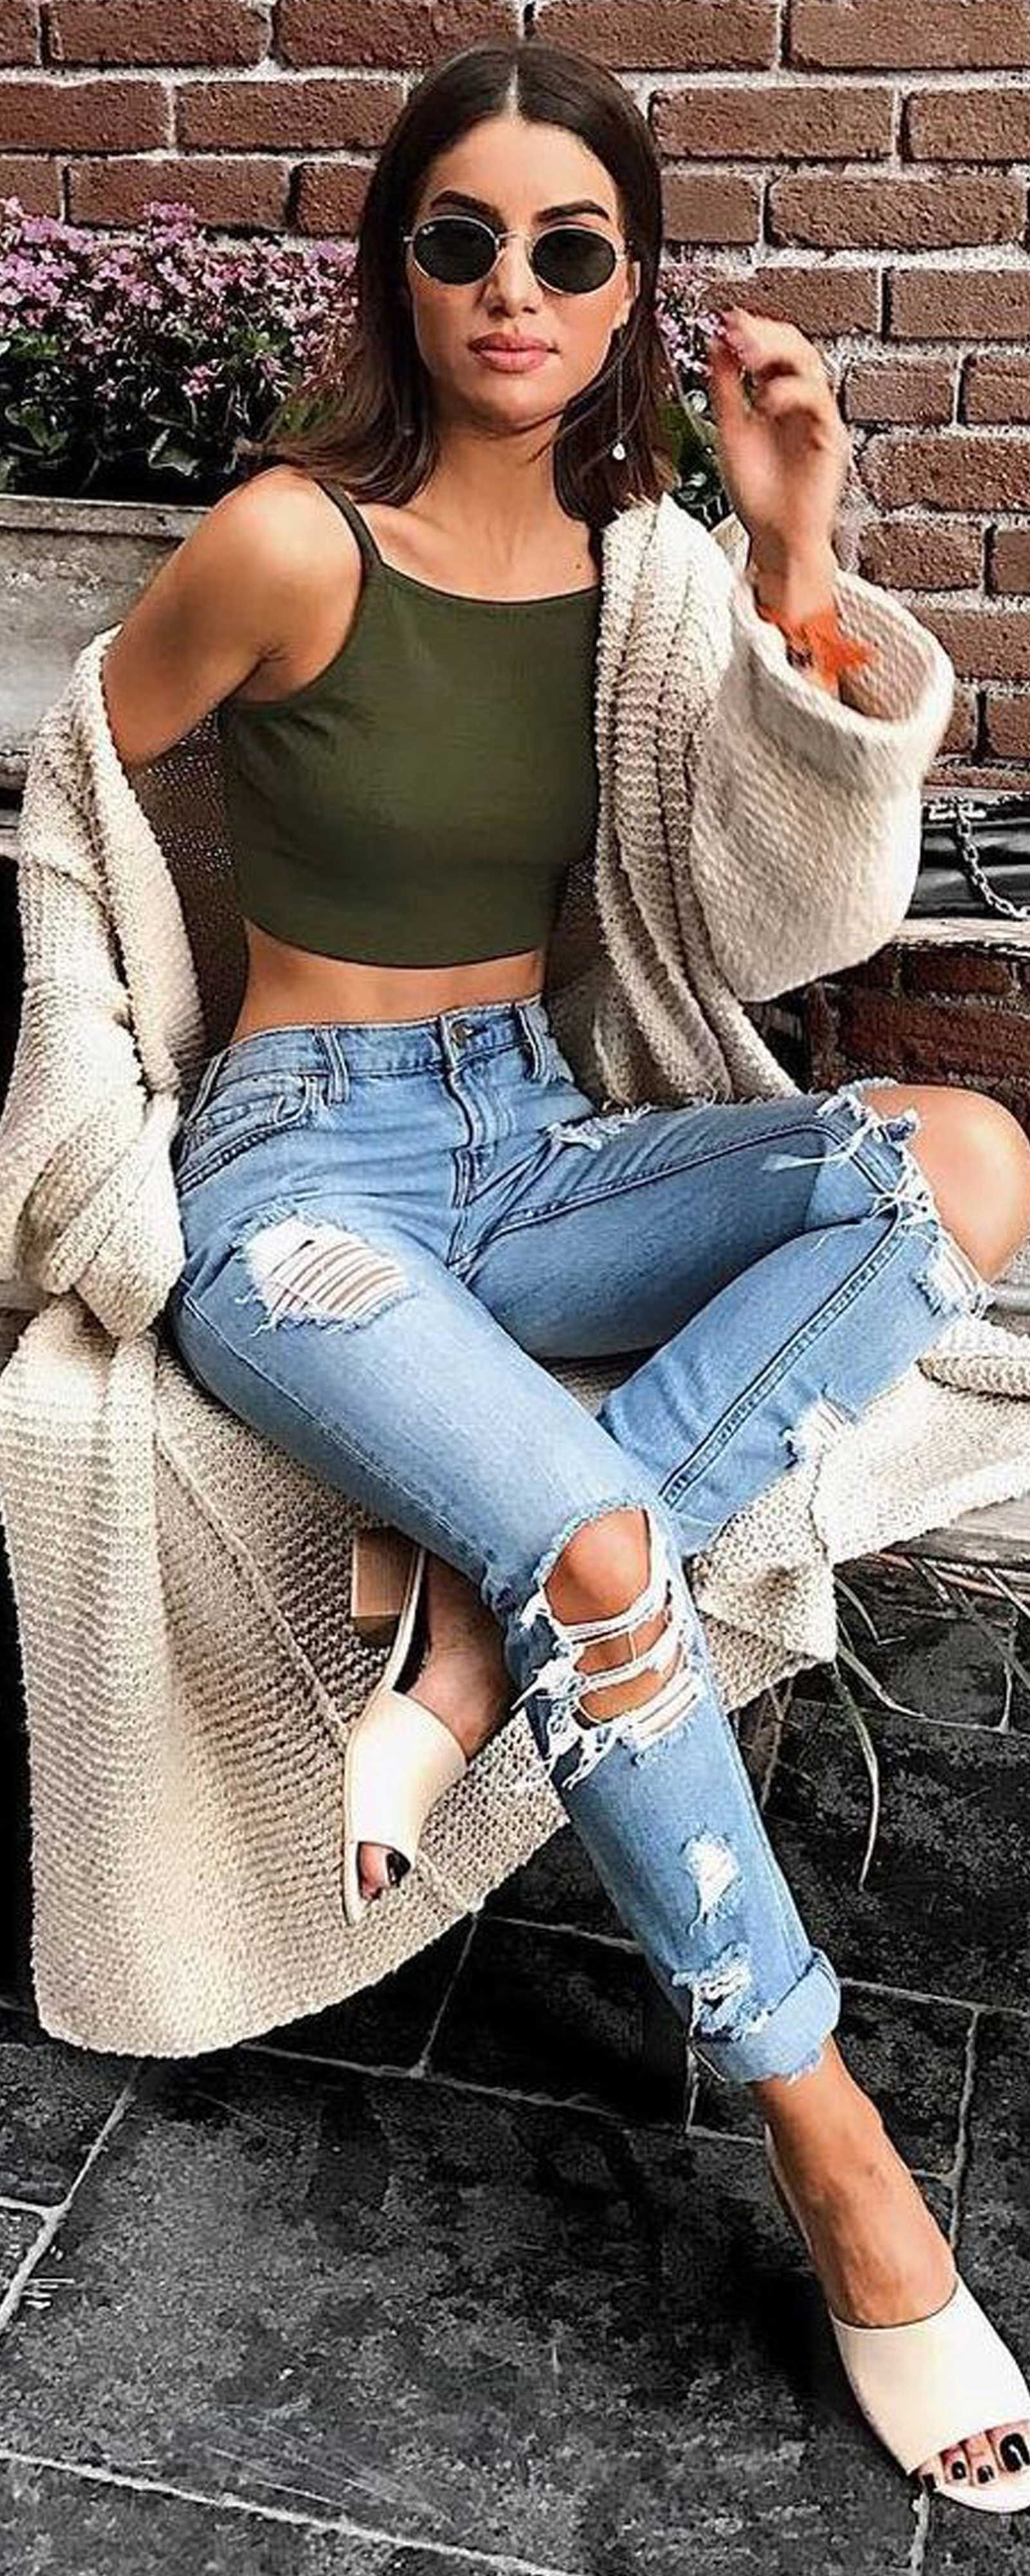 M Korte Die Je Meisjesproblemen Y De Beste Top 10 Jeans Oplost lFJTKu1c3